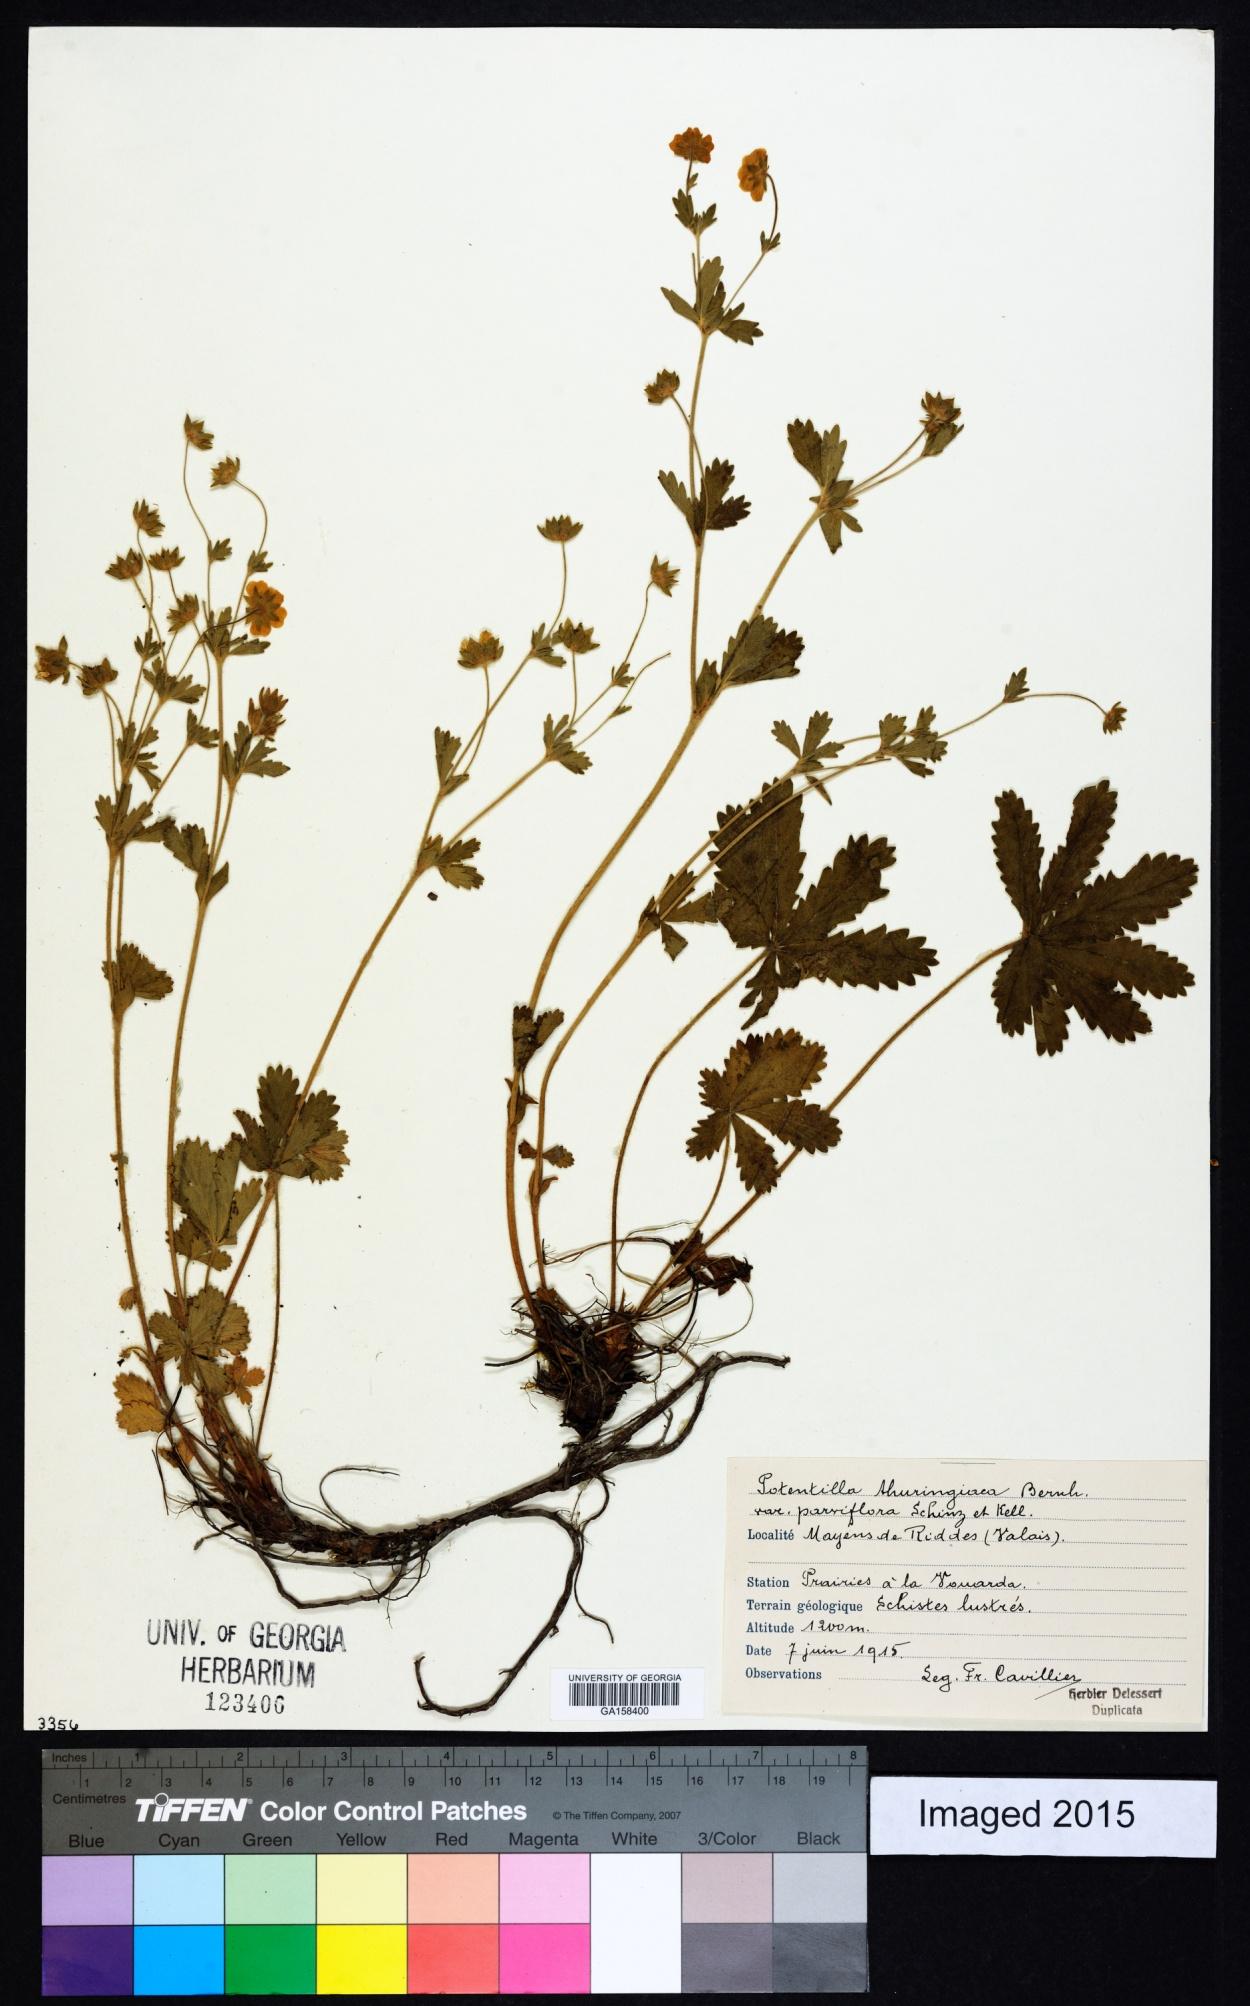 Potentilla thuringiaca image